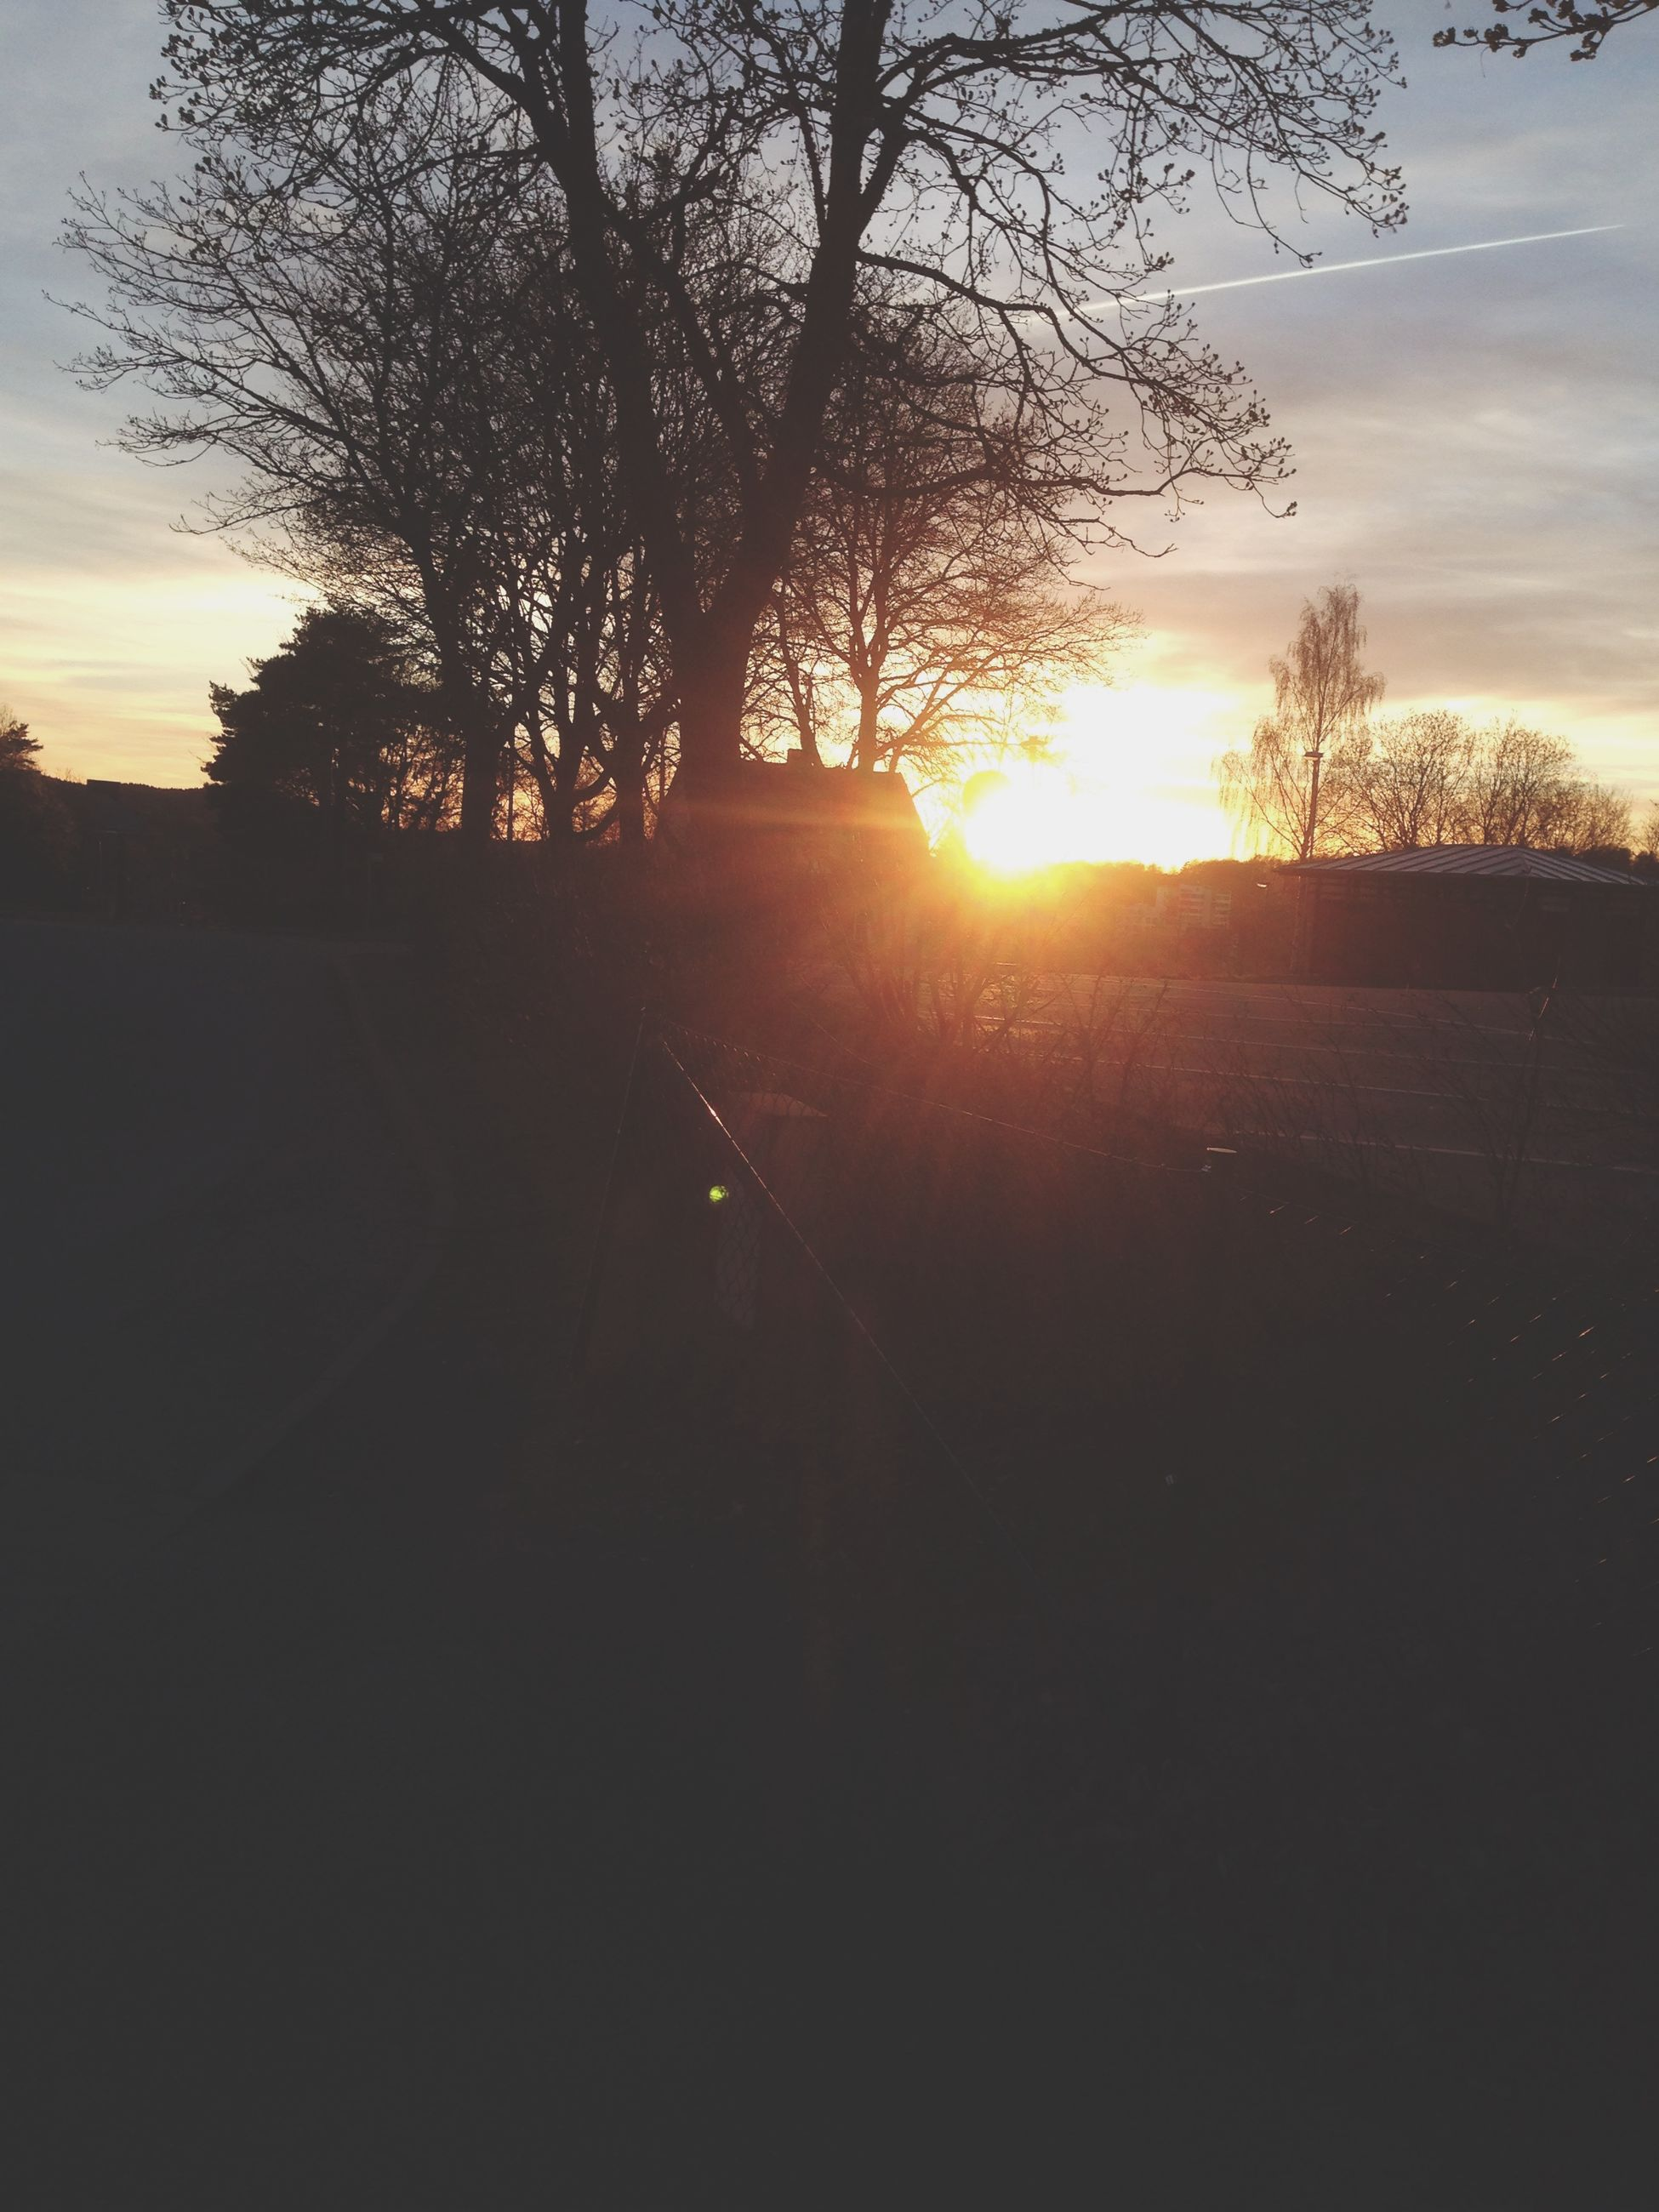 sunset, sun, silhouette, tree, sky, tranquility, tranquil scene, scenics, beauty in nature, sunlight, orange color, sunbeam, nature, cloud - sky, bare tree, landscape, idyllic, lens flare, back lit, branch